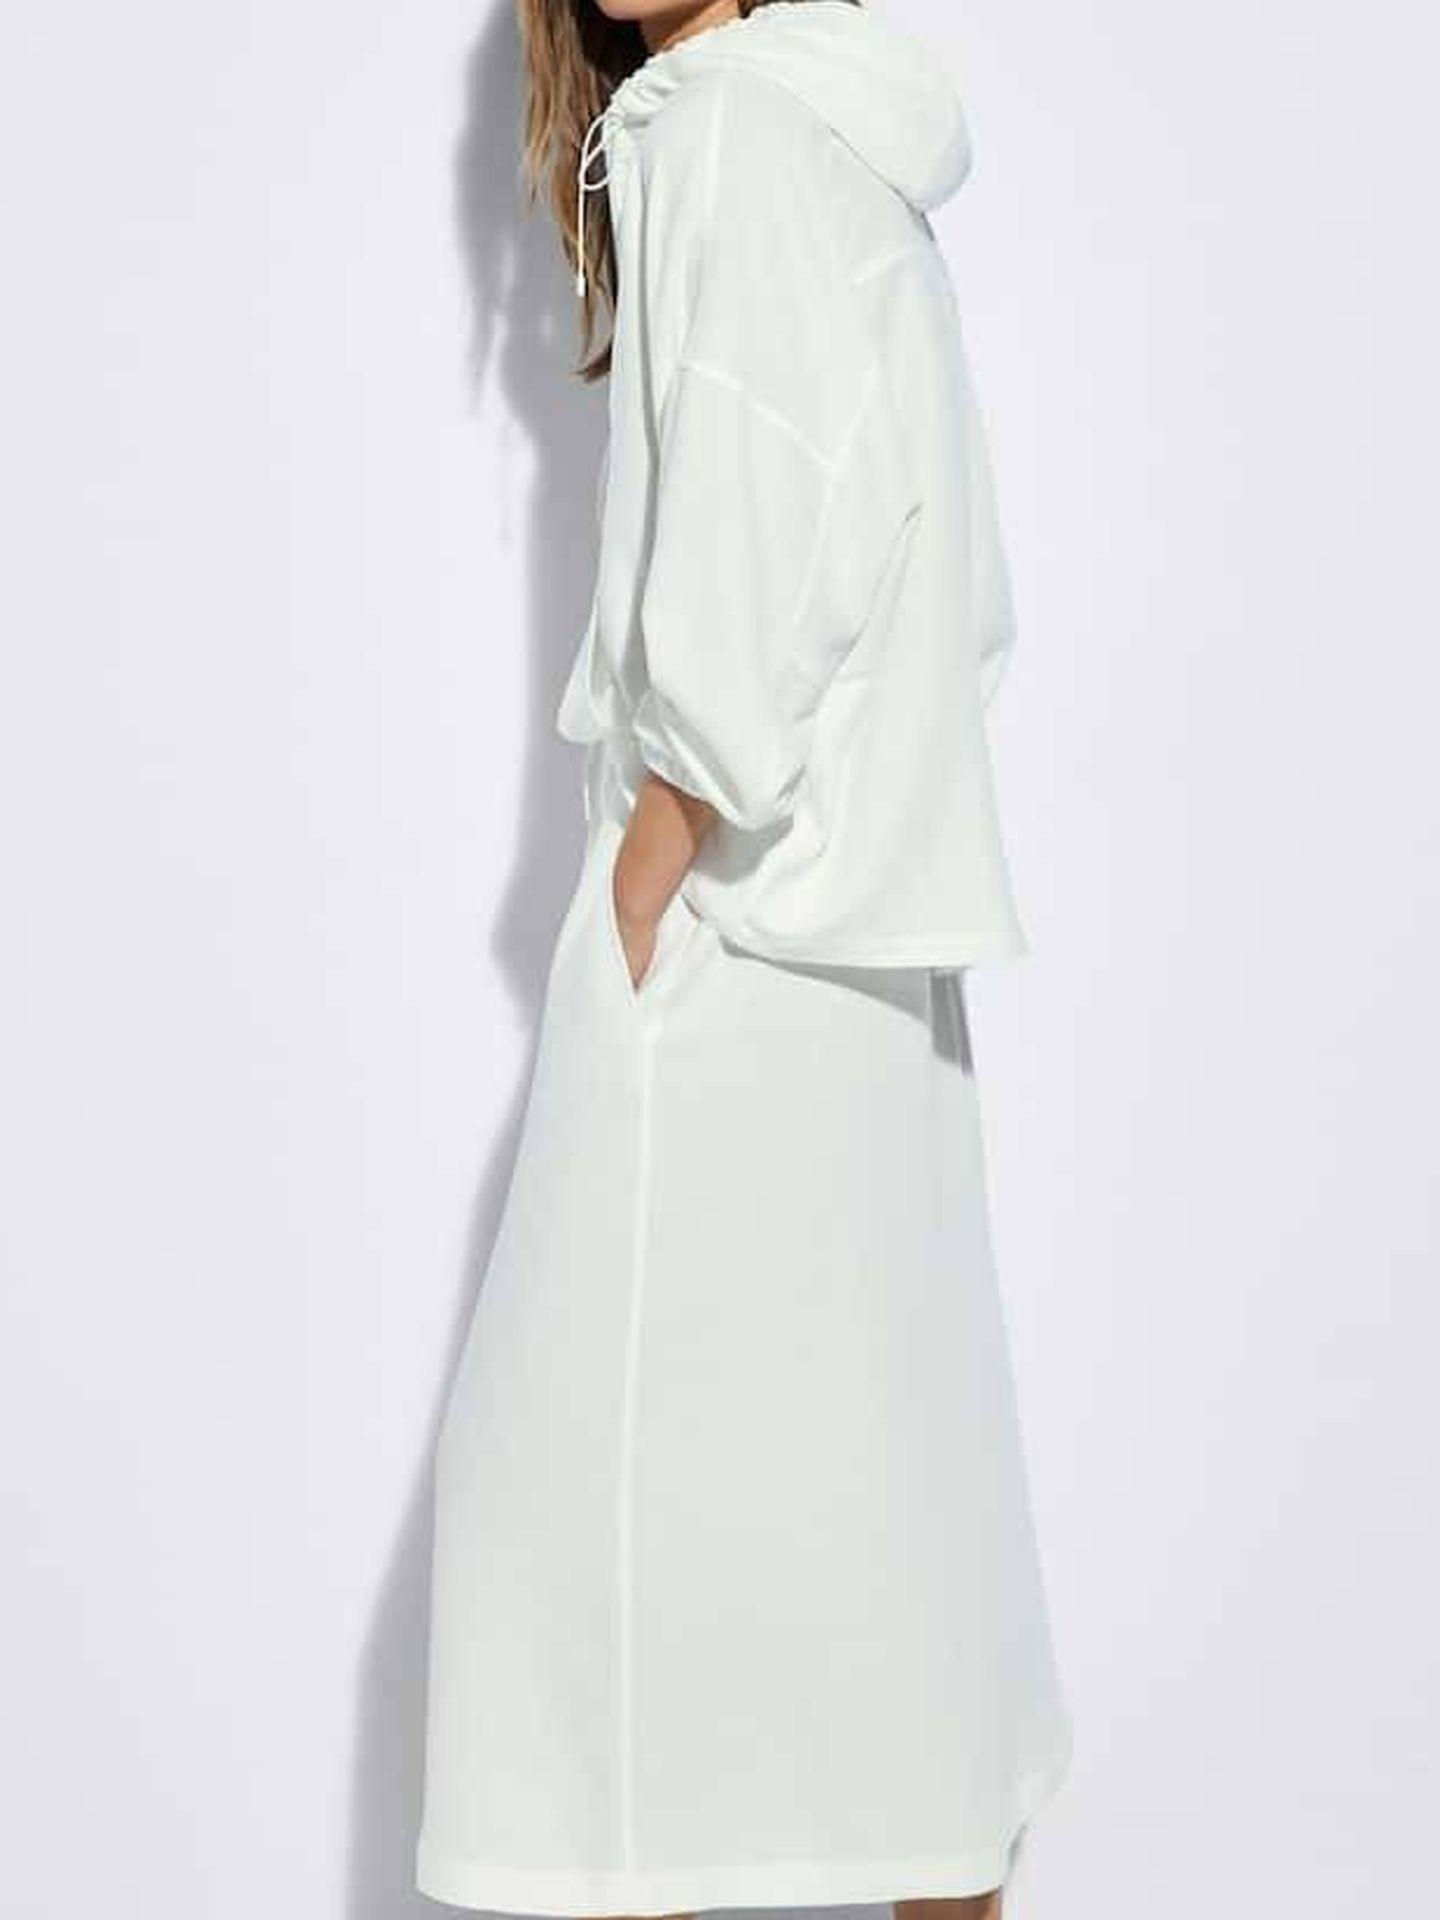 Falda blanca de Massimo Dutti. (Cortesía)